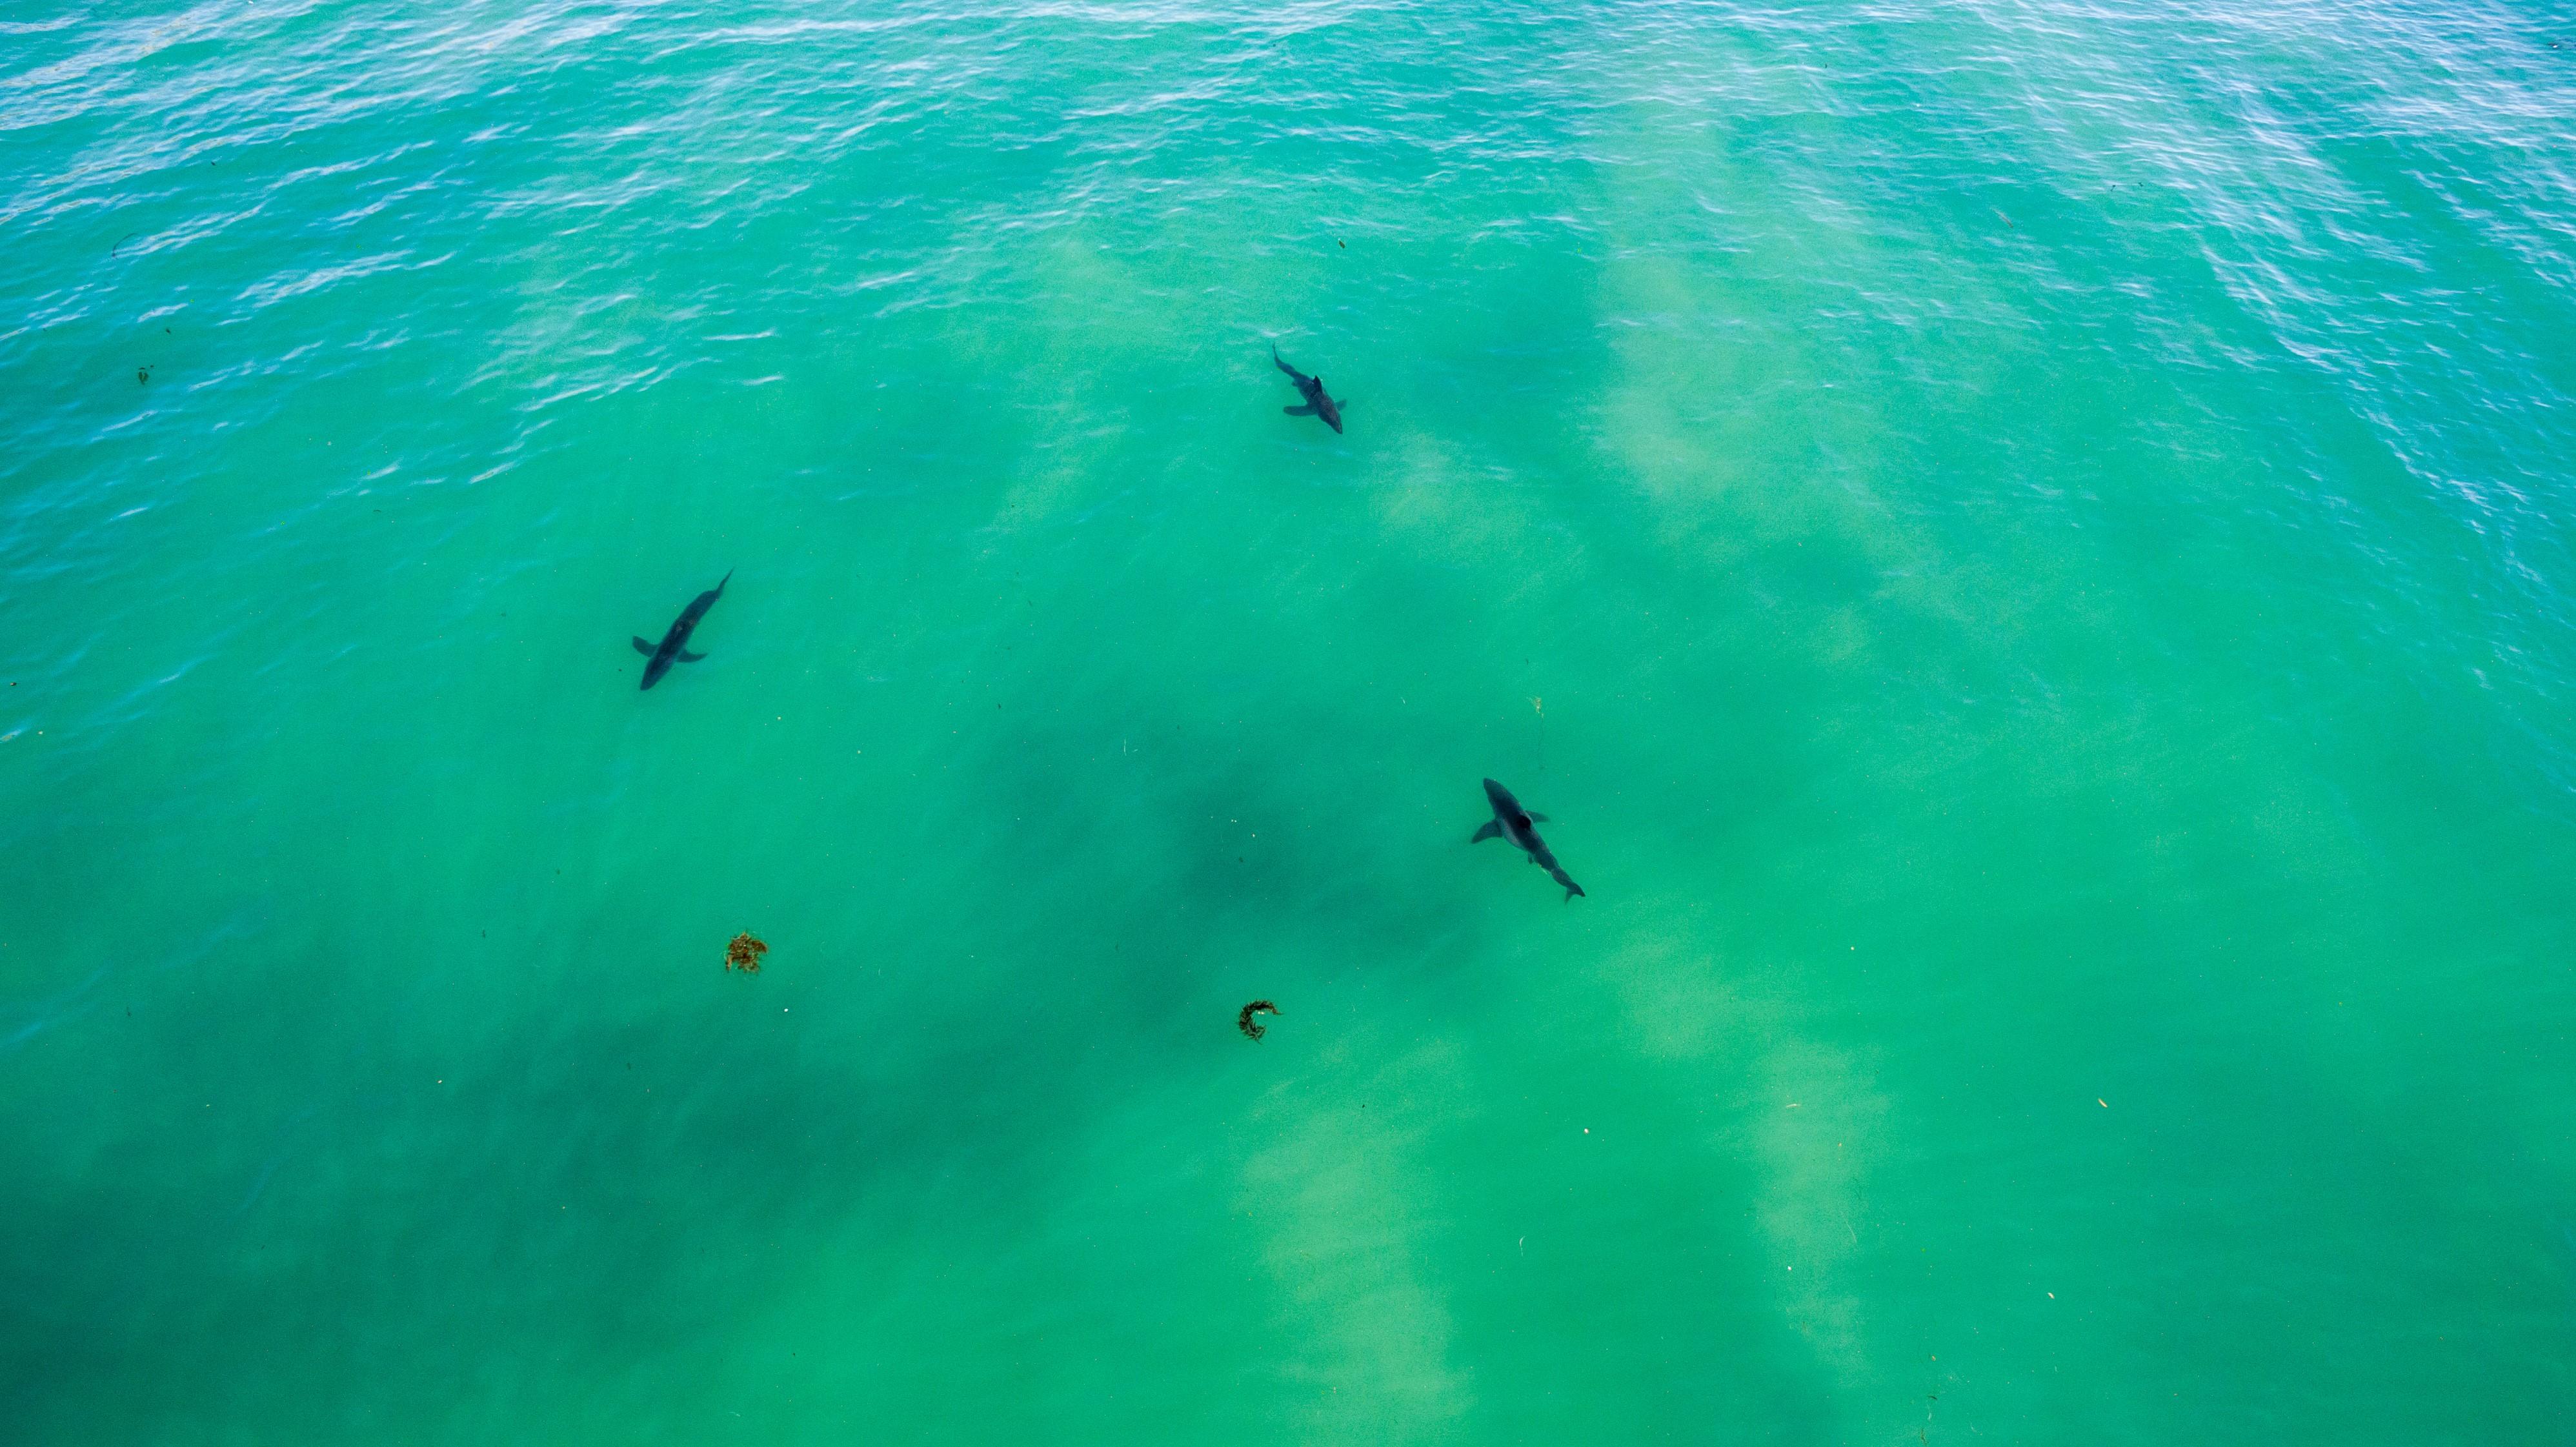 A pack of sharks was photographed in 2017 near Capistrano Beach. Photo: Courtesy of Matt Larmand